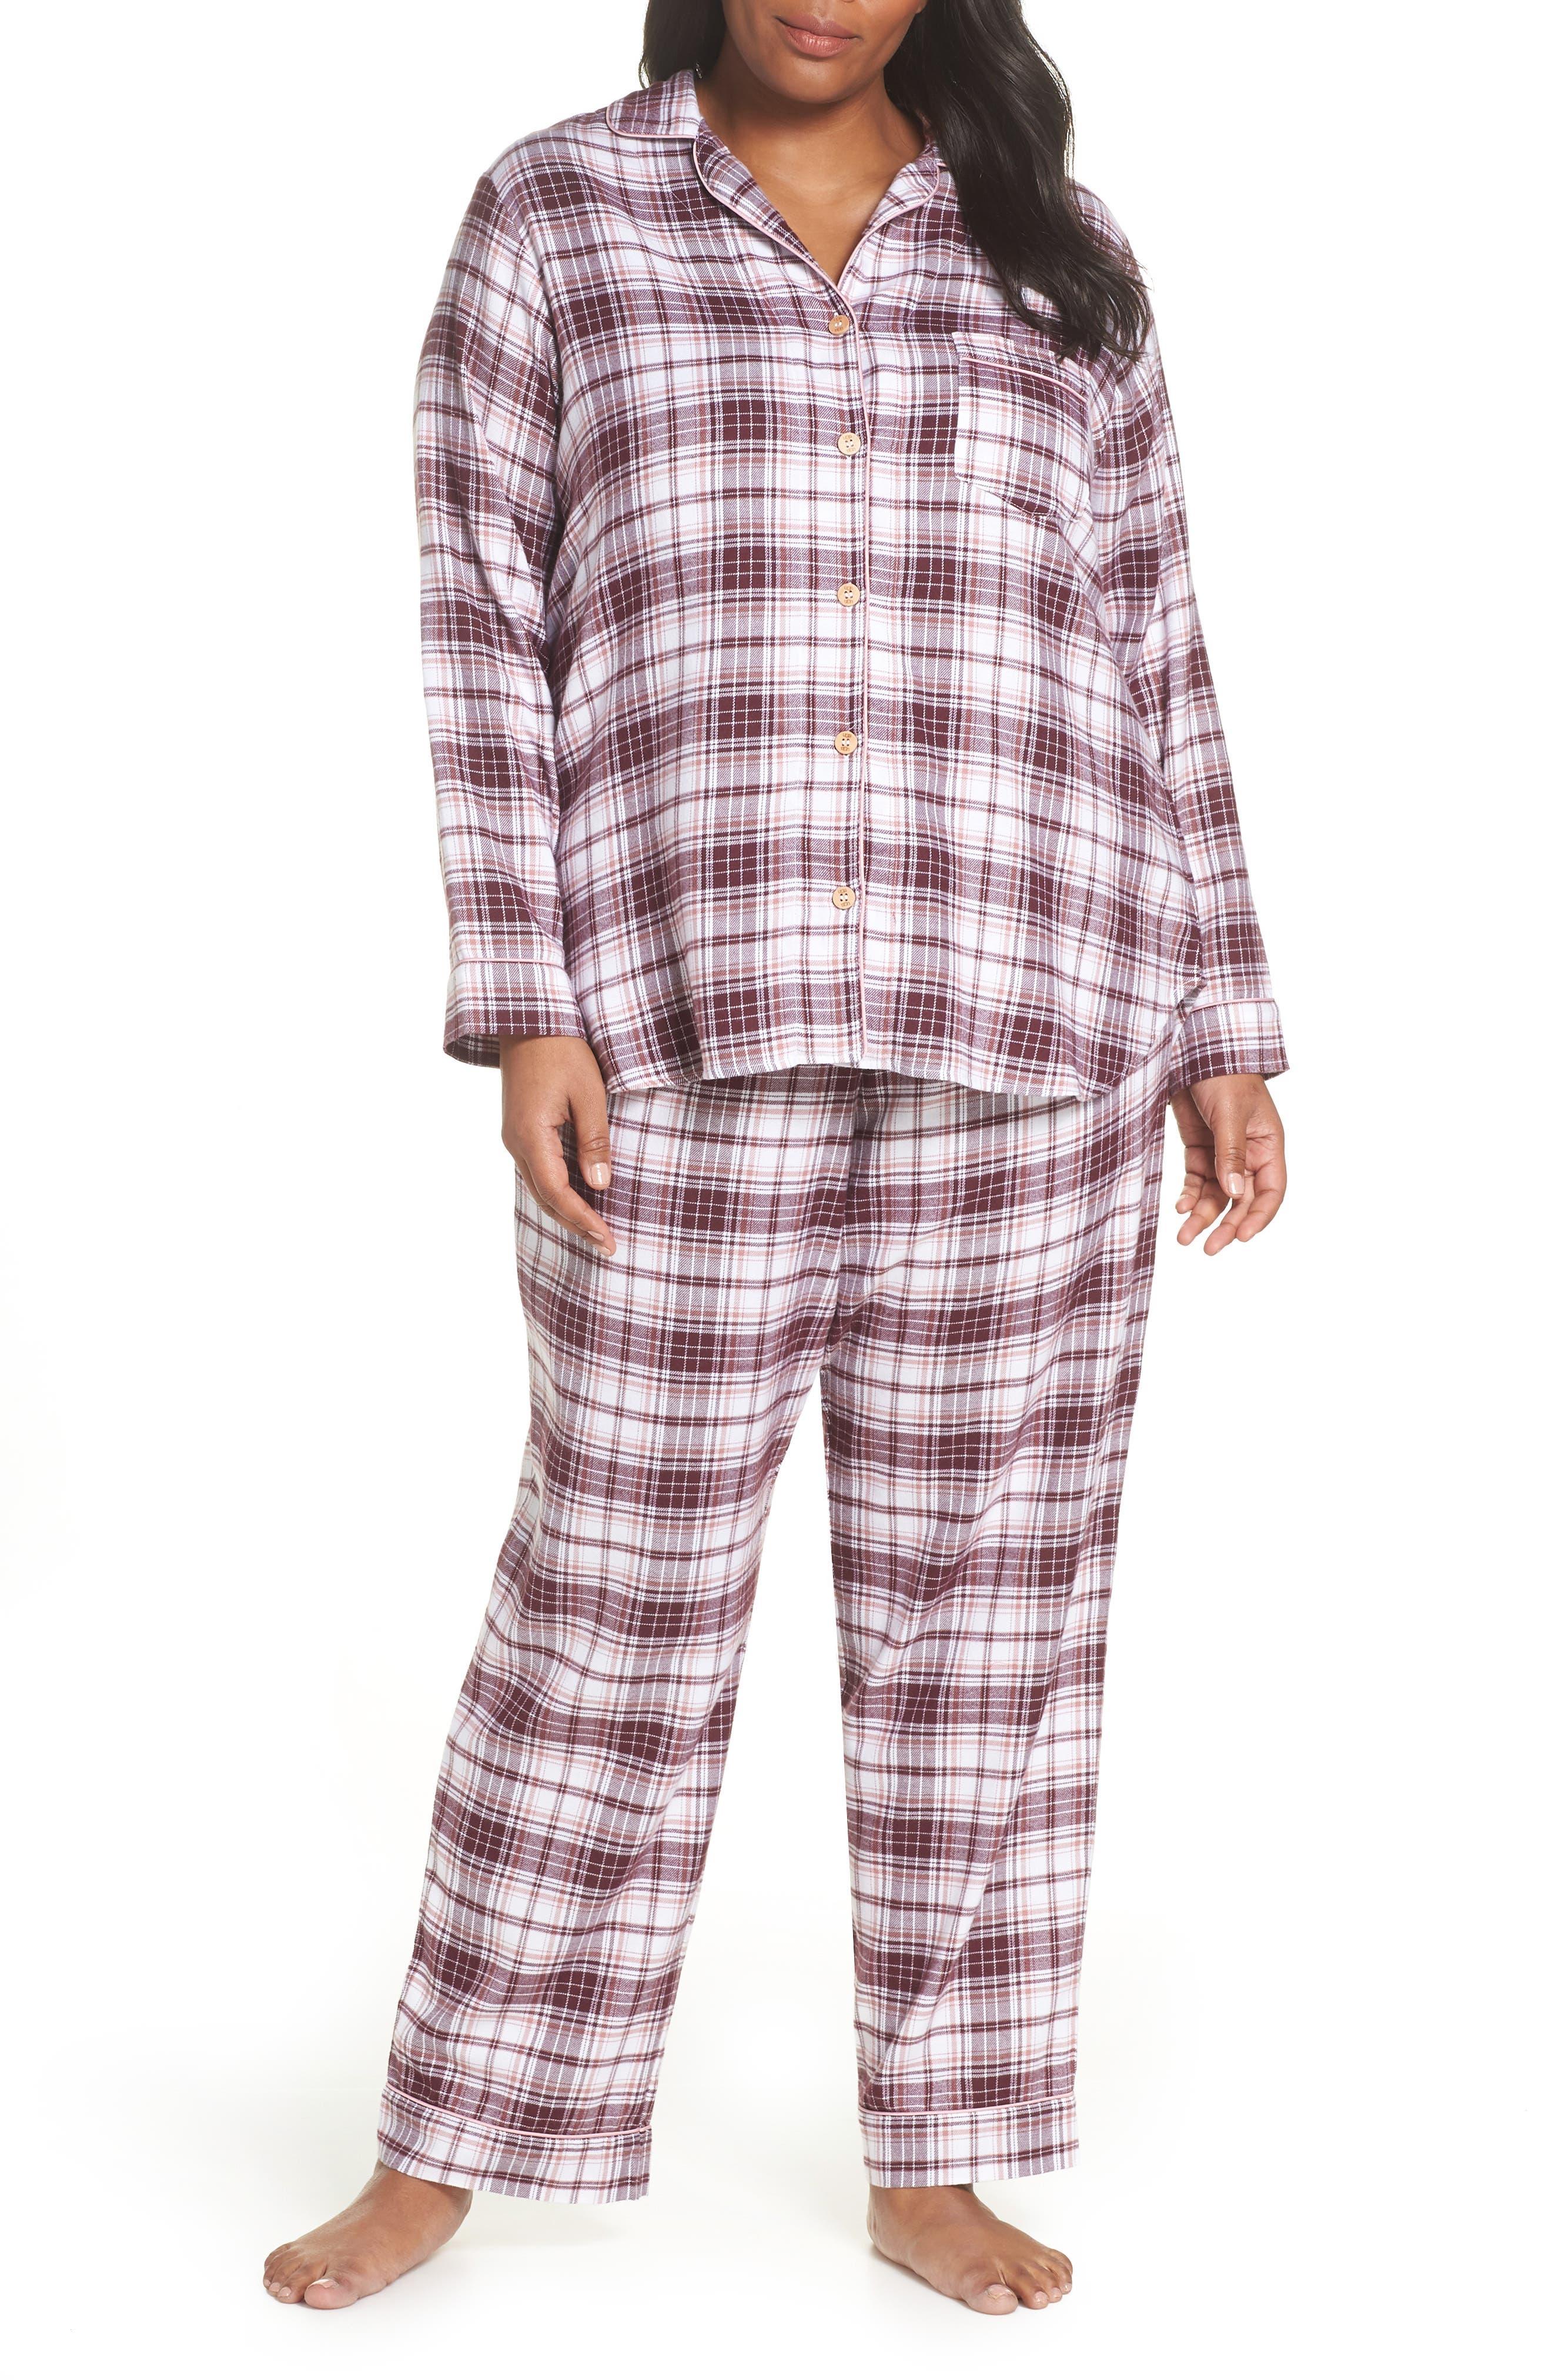 Plus Size Ugg Raven Plaid Pajamas